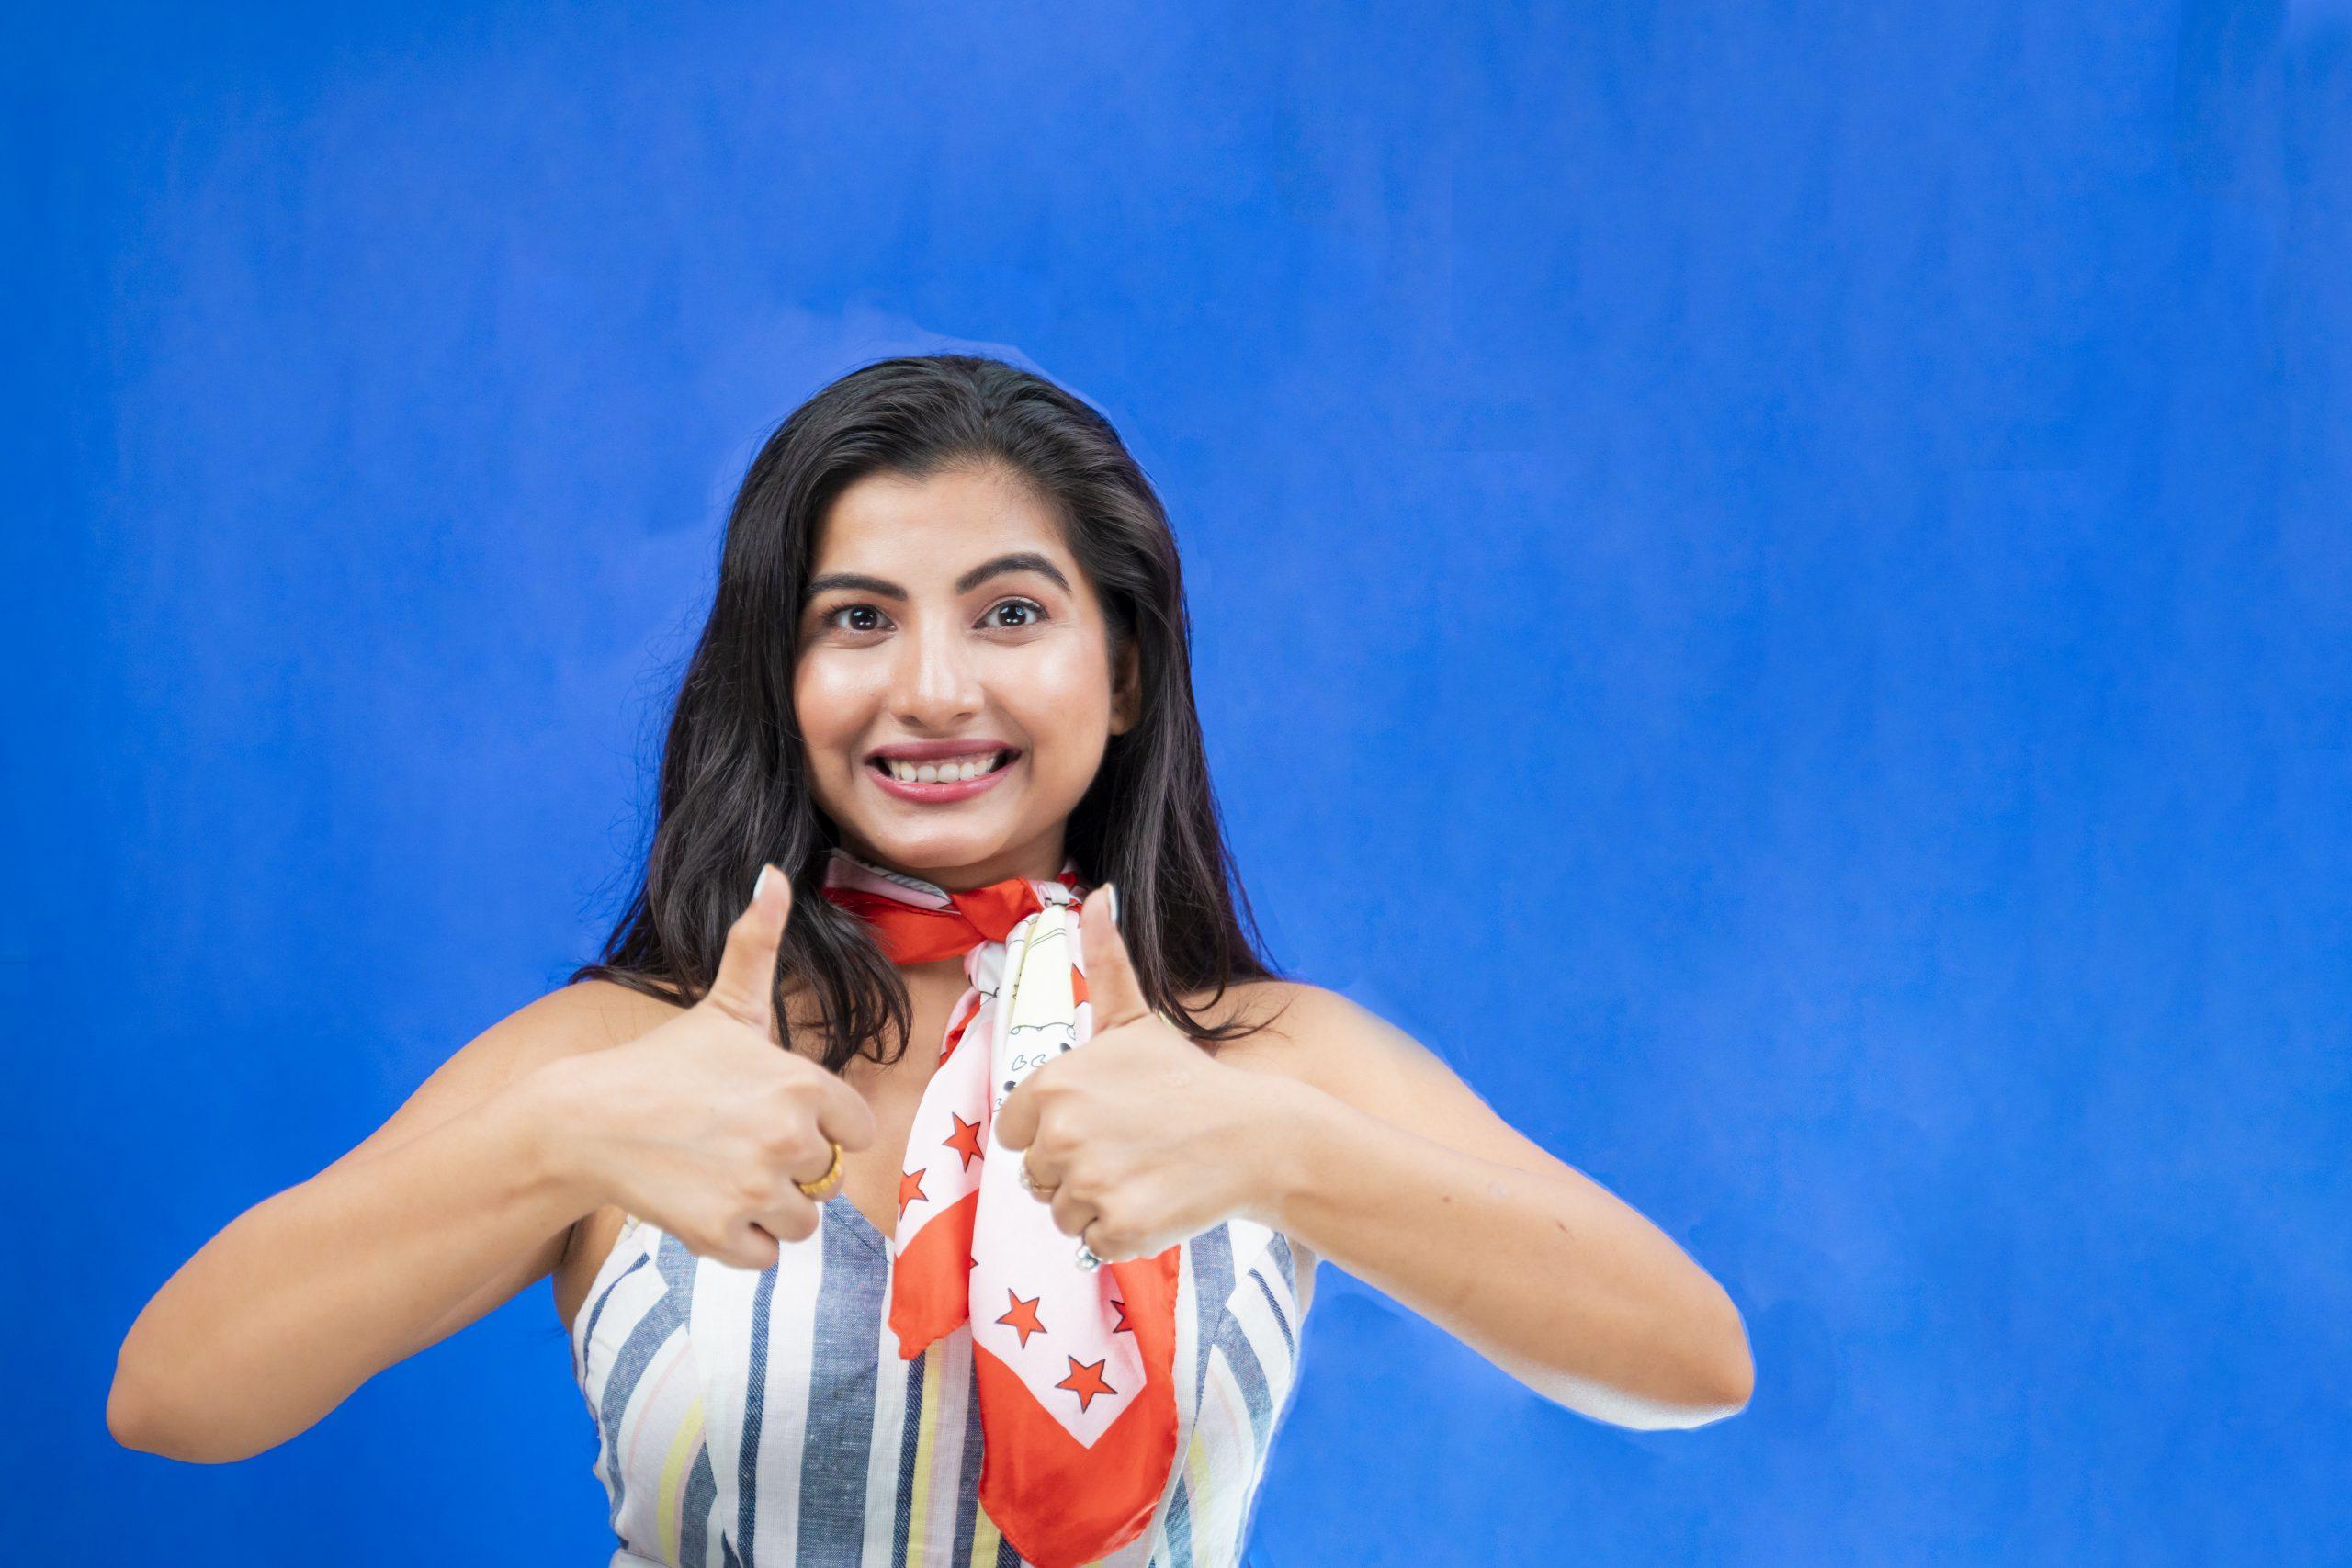 Indian girl thumbs up